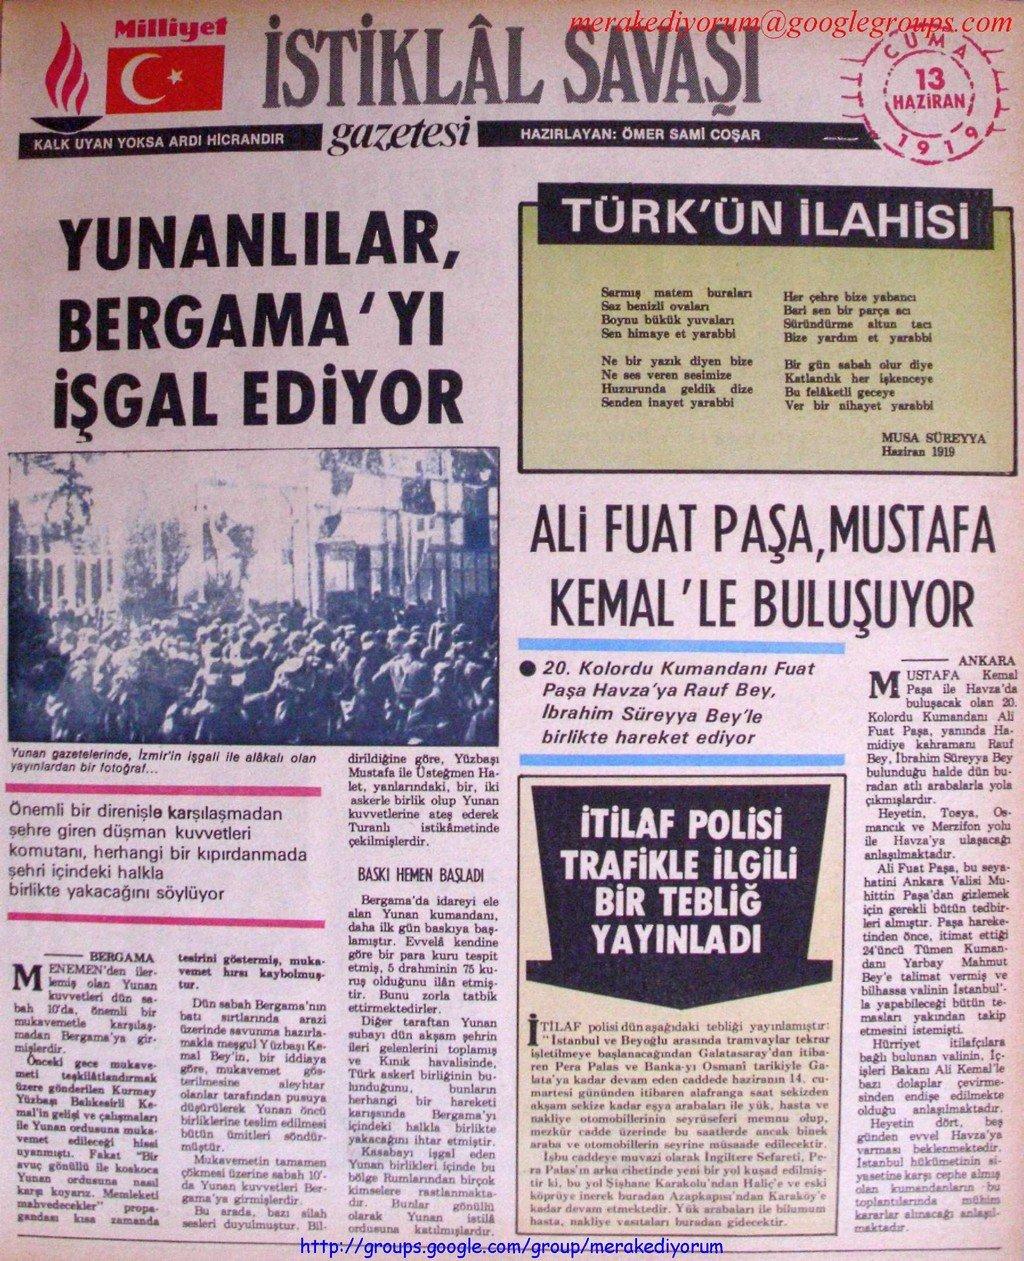 istiklal savaşı gazetesi - 13 haziran 1919